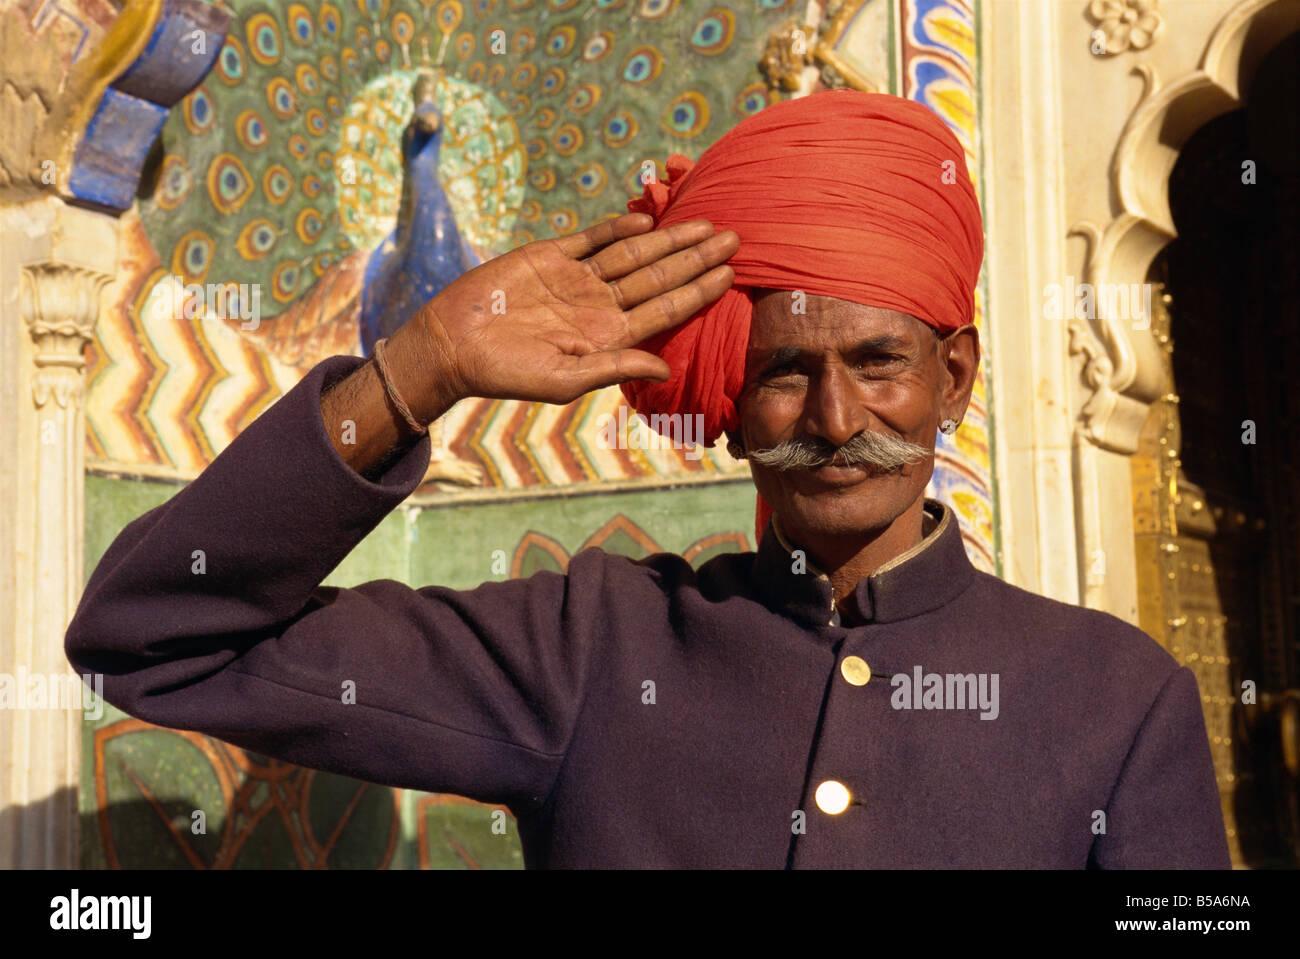 Guard in turban saluting at City Palace Jaipur Rajasthan state India Asia - Stock Image